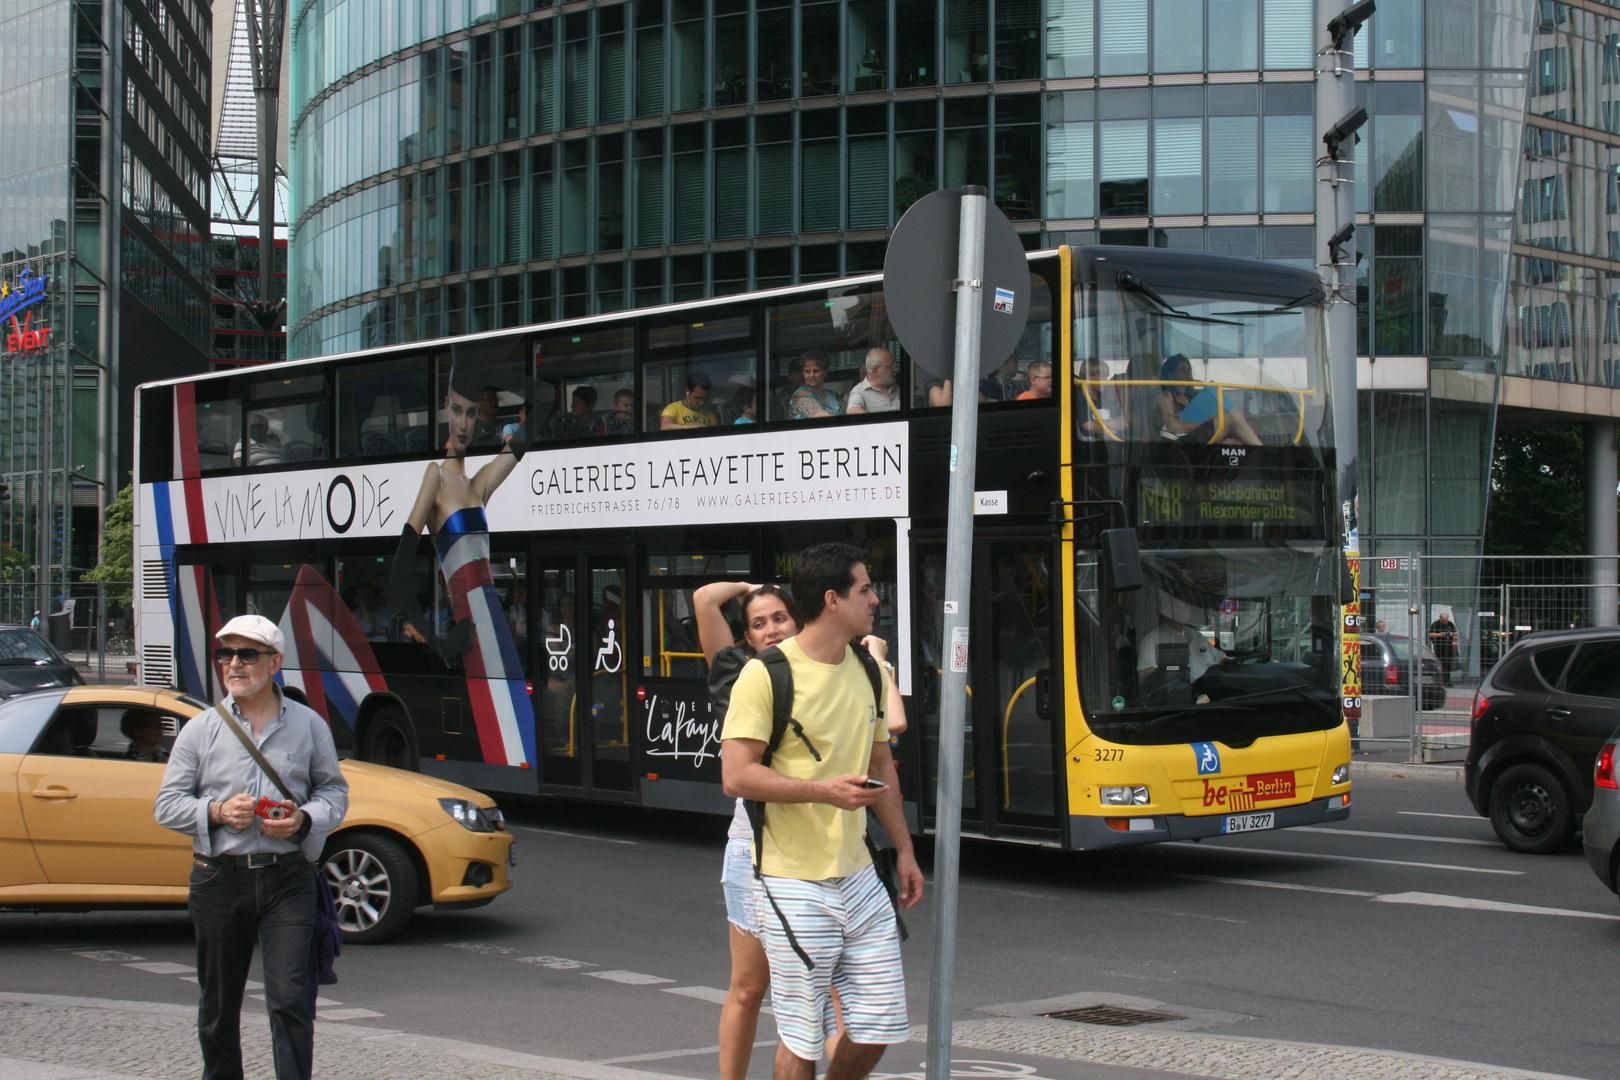 Bus / Berlin ♥